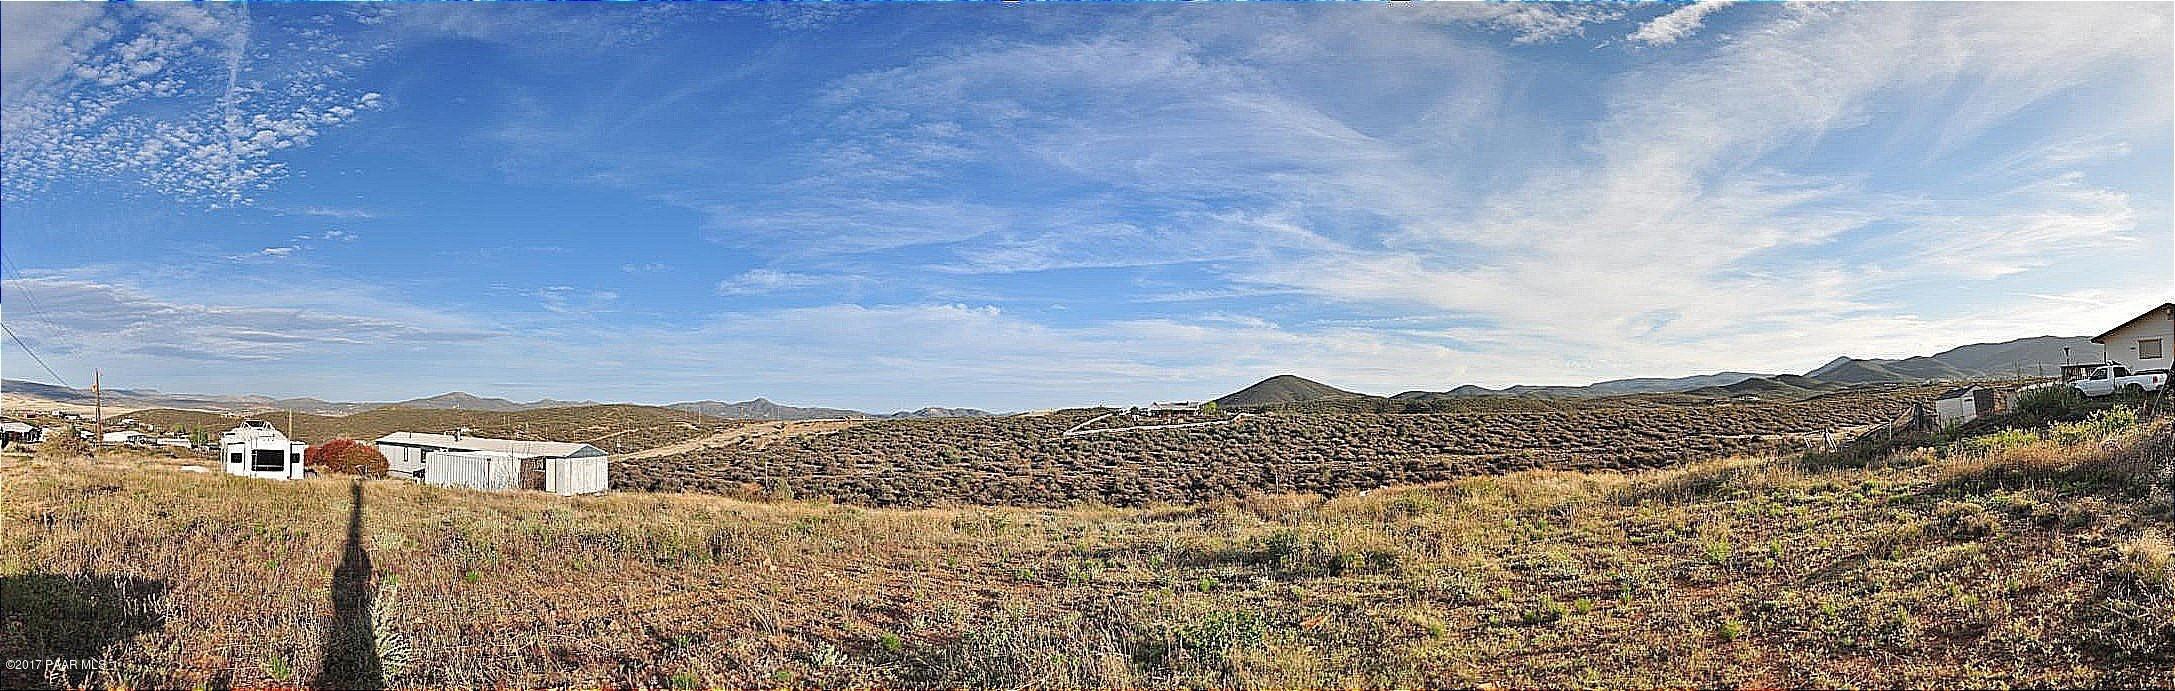 10765 Powerline,Dewey-Humboldt,Arizona,86327,Residential,Powerline,1003714